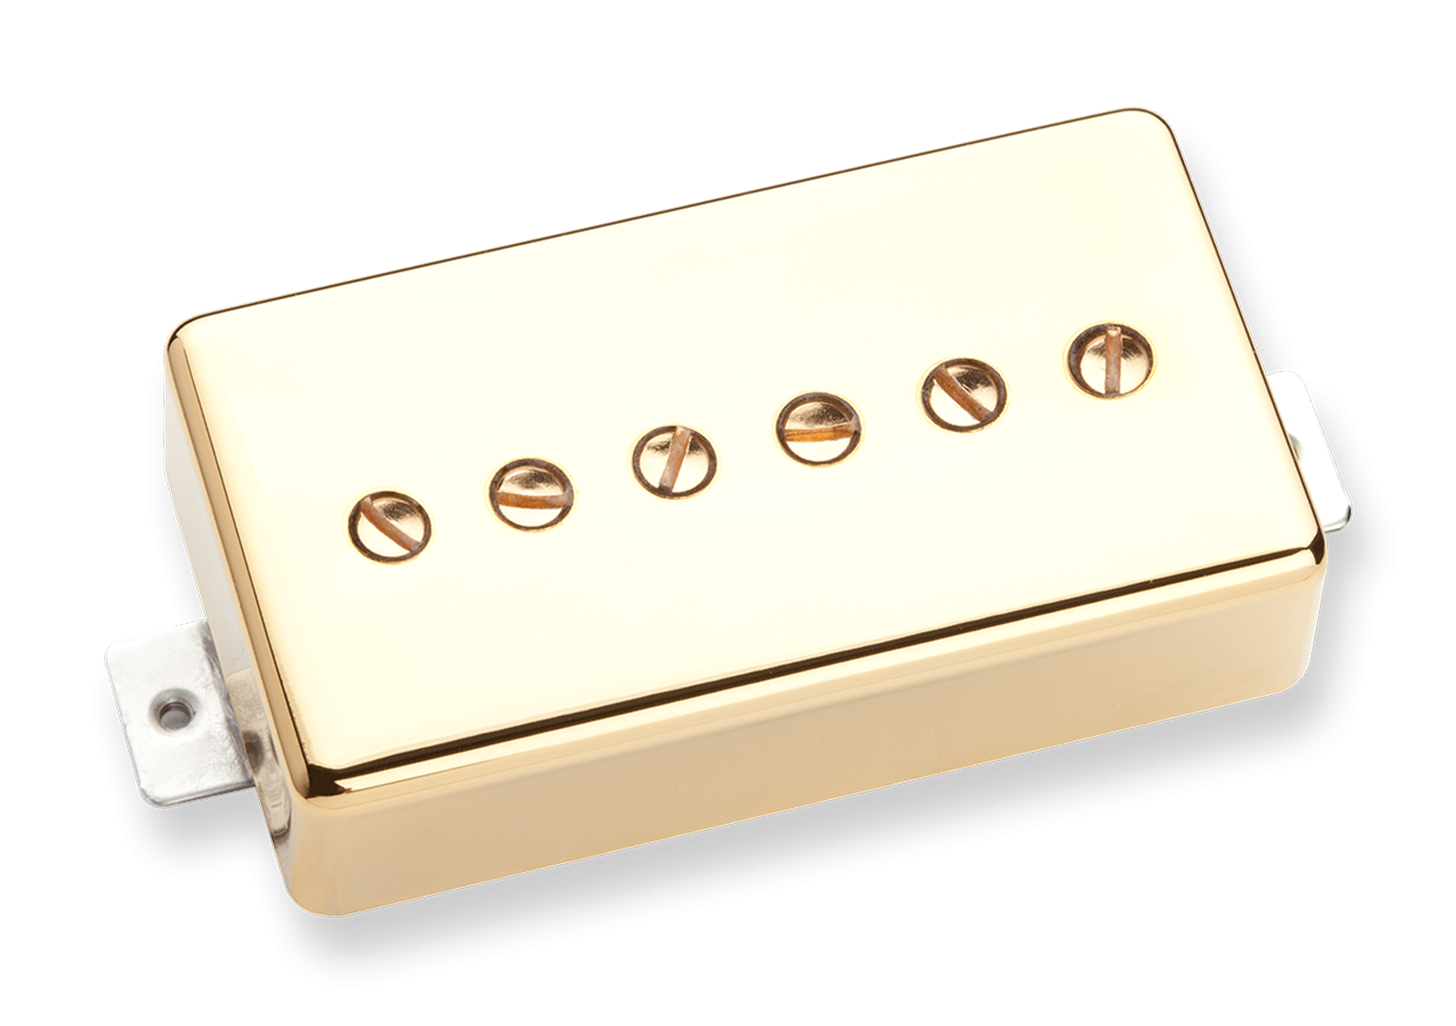 Seymour Duncan Phat Cat - SPH90-1N Neck Gold Cover